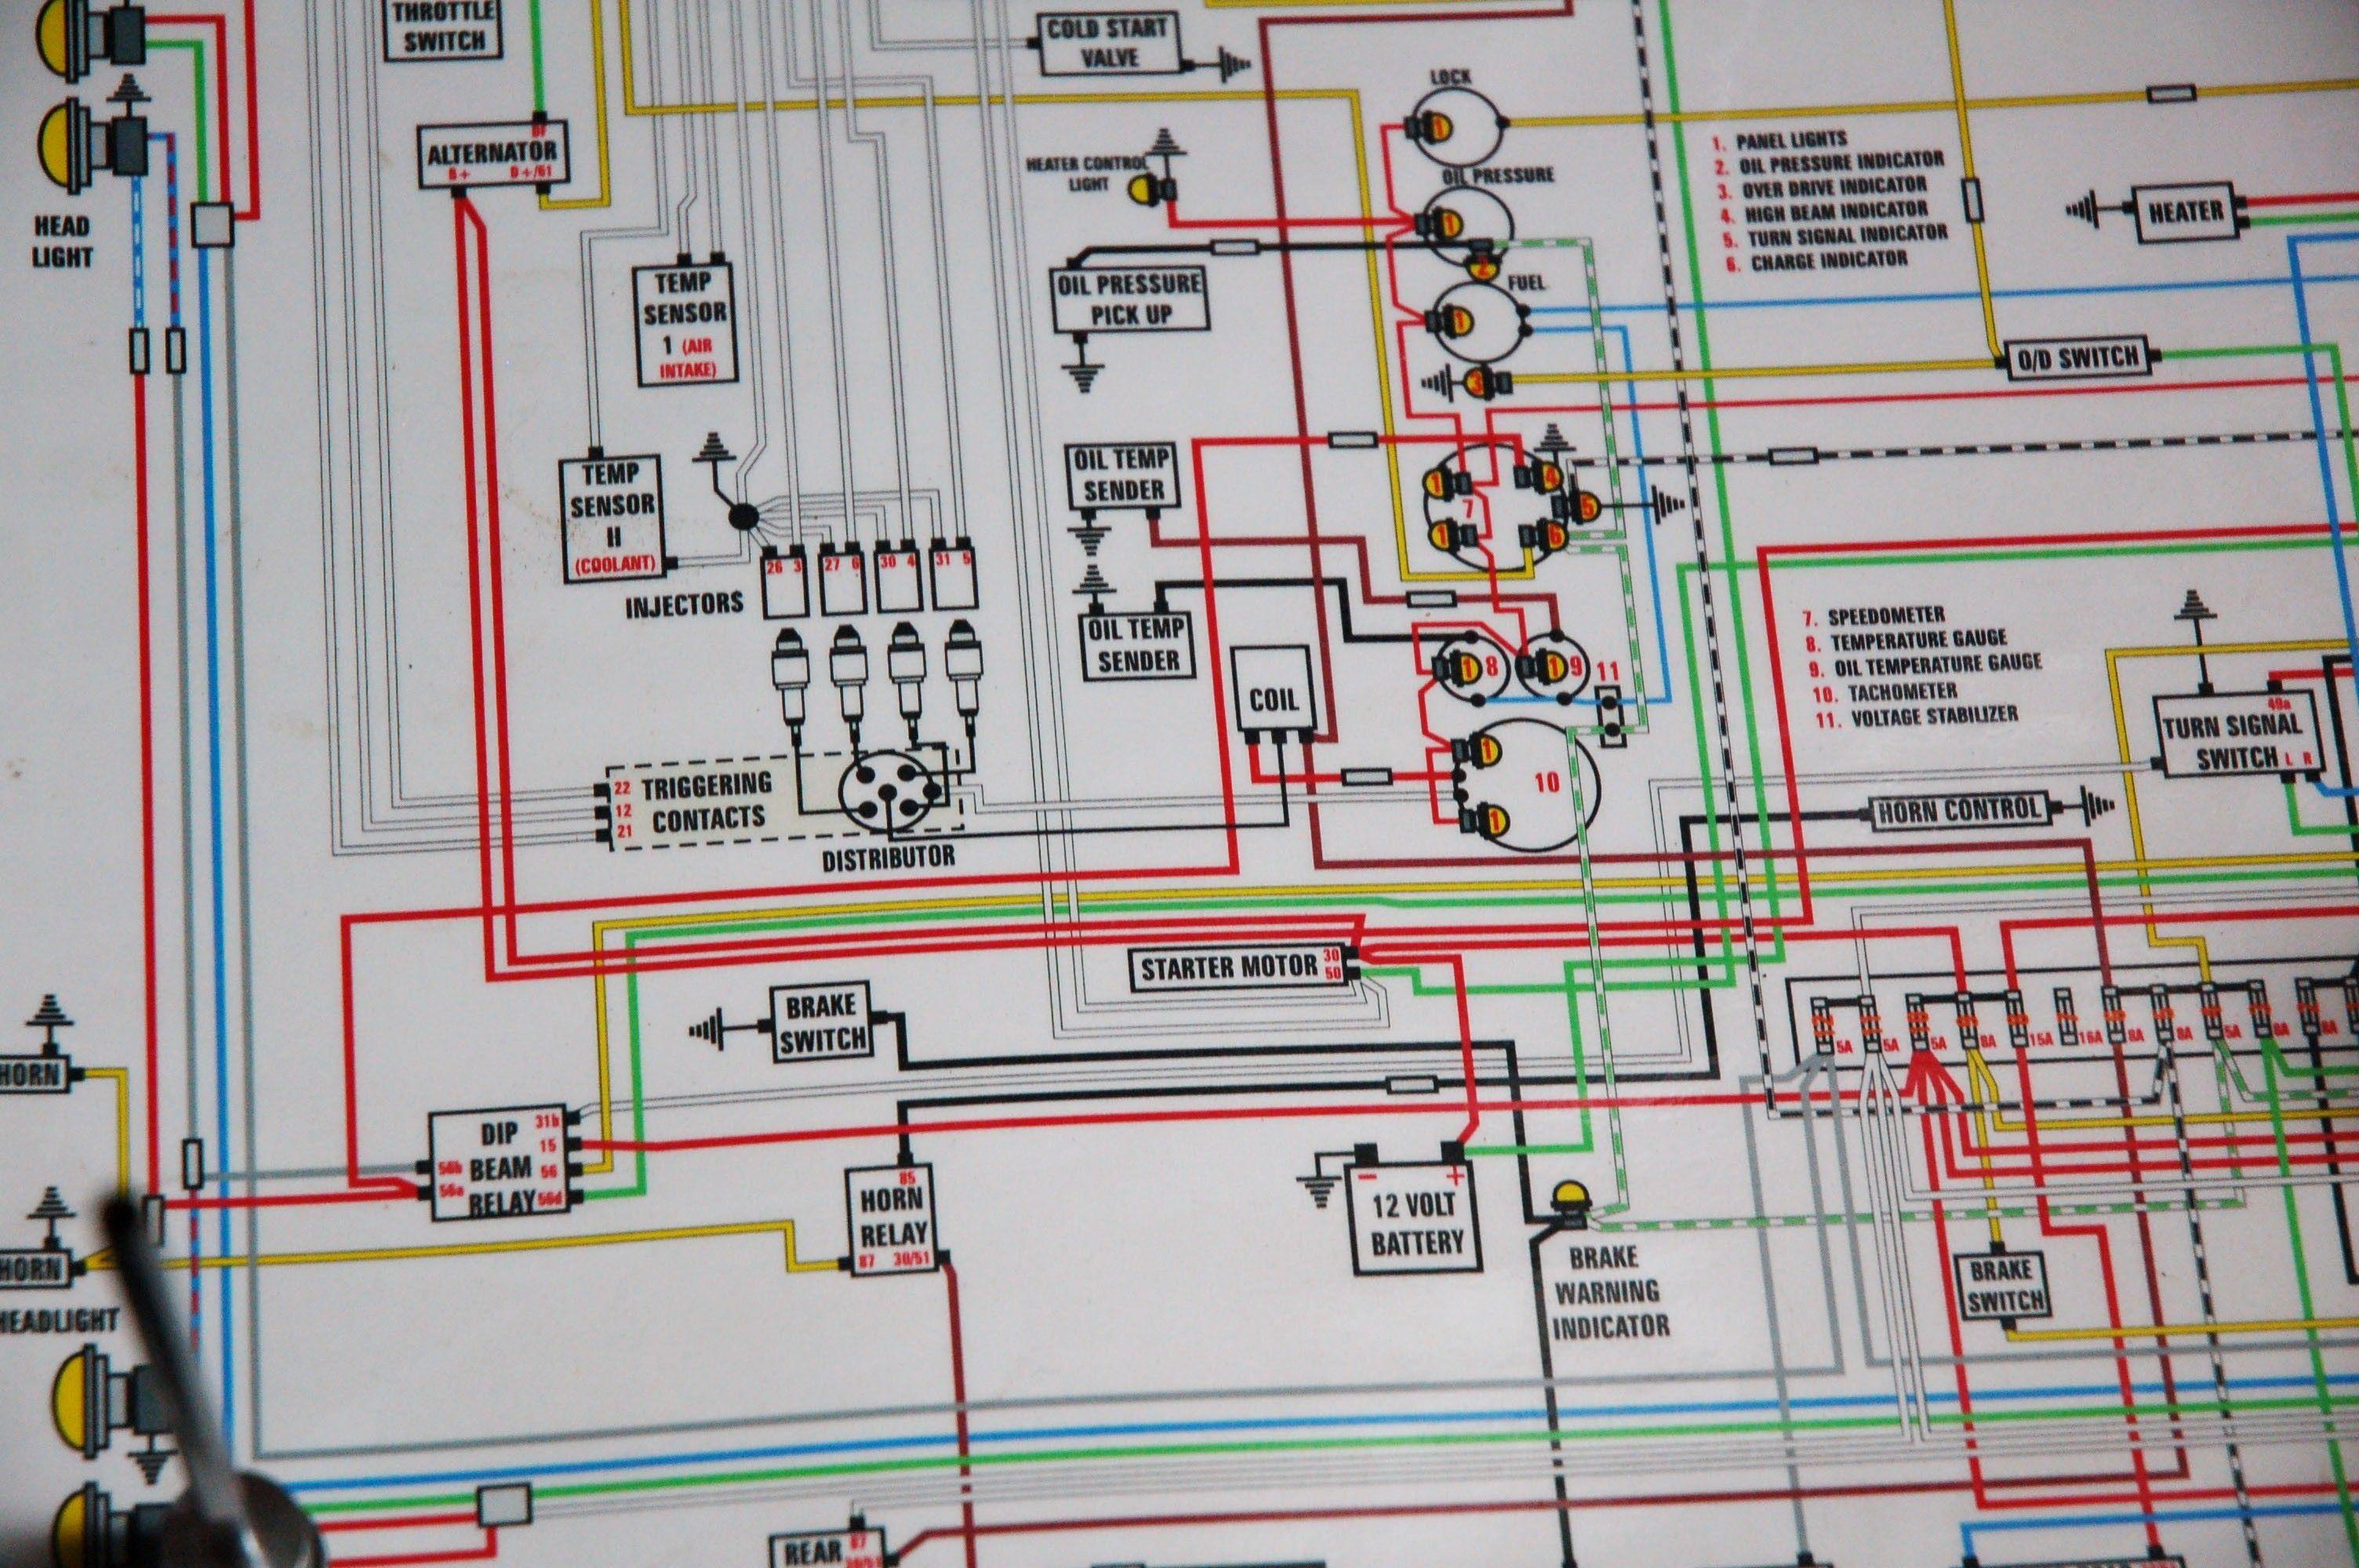 Unique Garage Sub Panel Wiring Diagram In 2020 Diagram Automotive Electrical Motorcycle Wiring